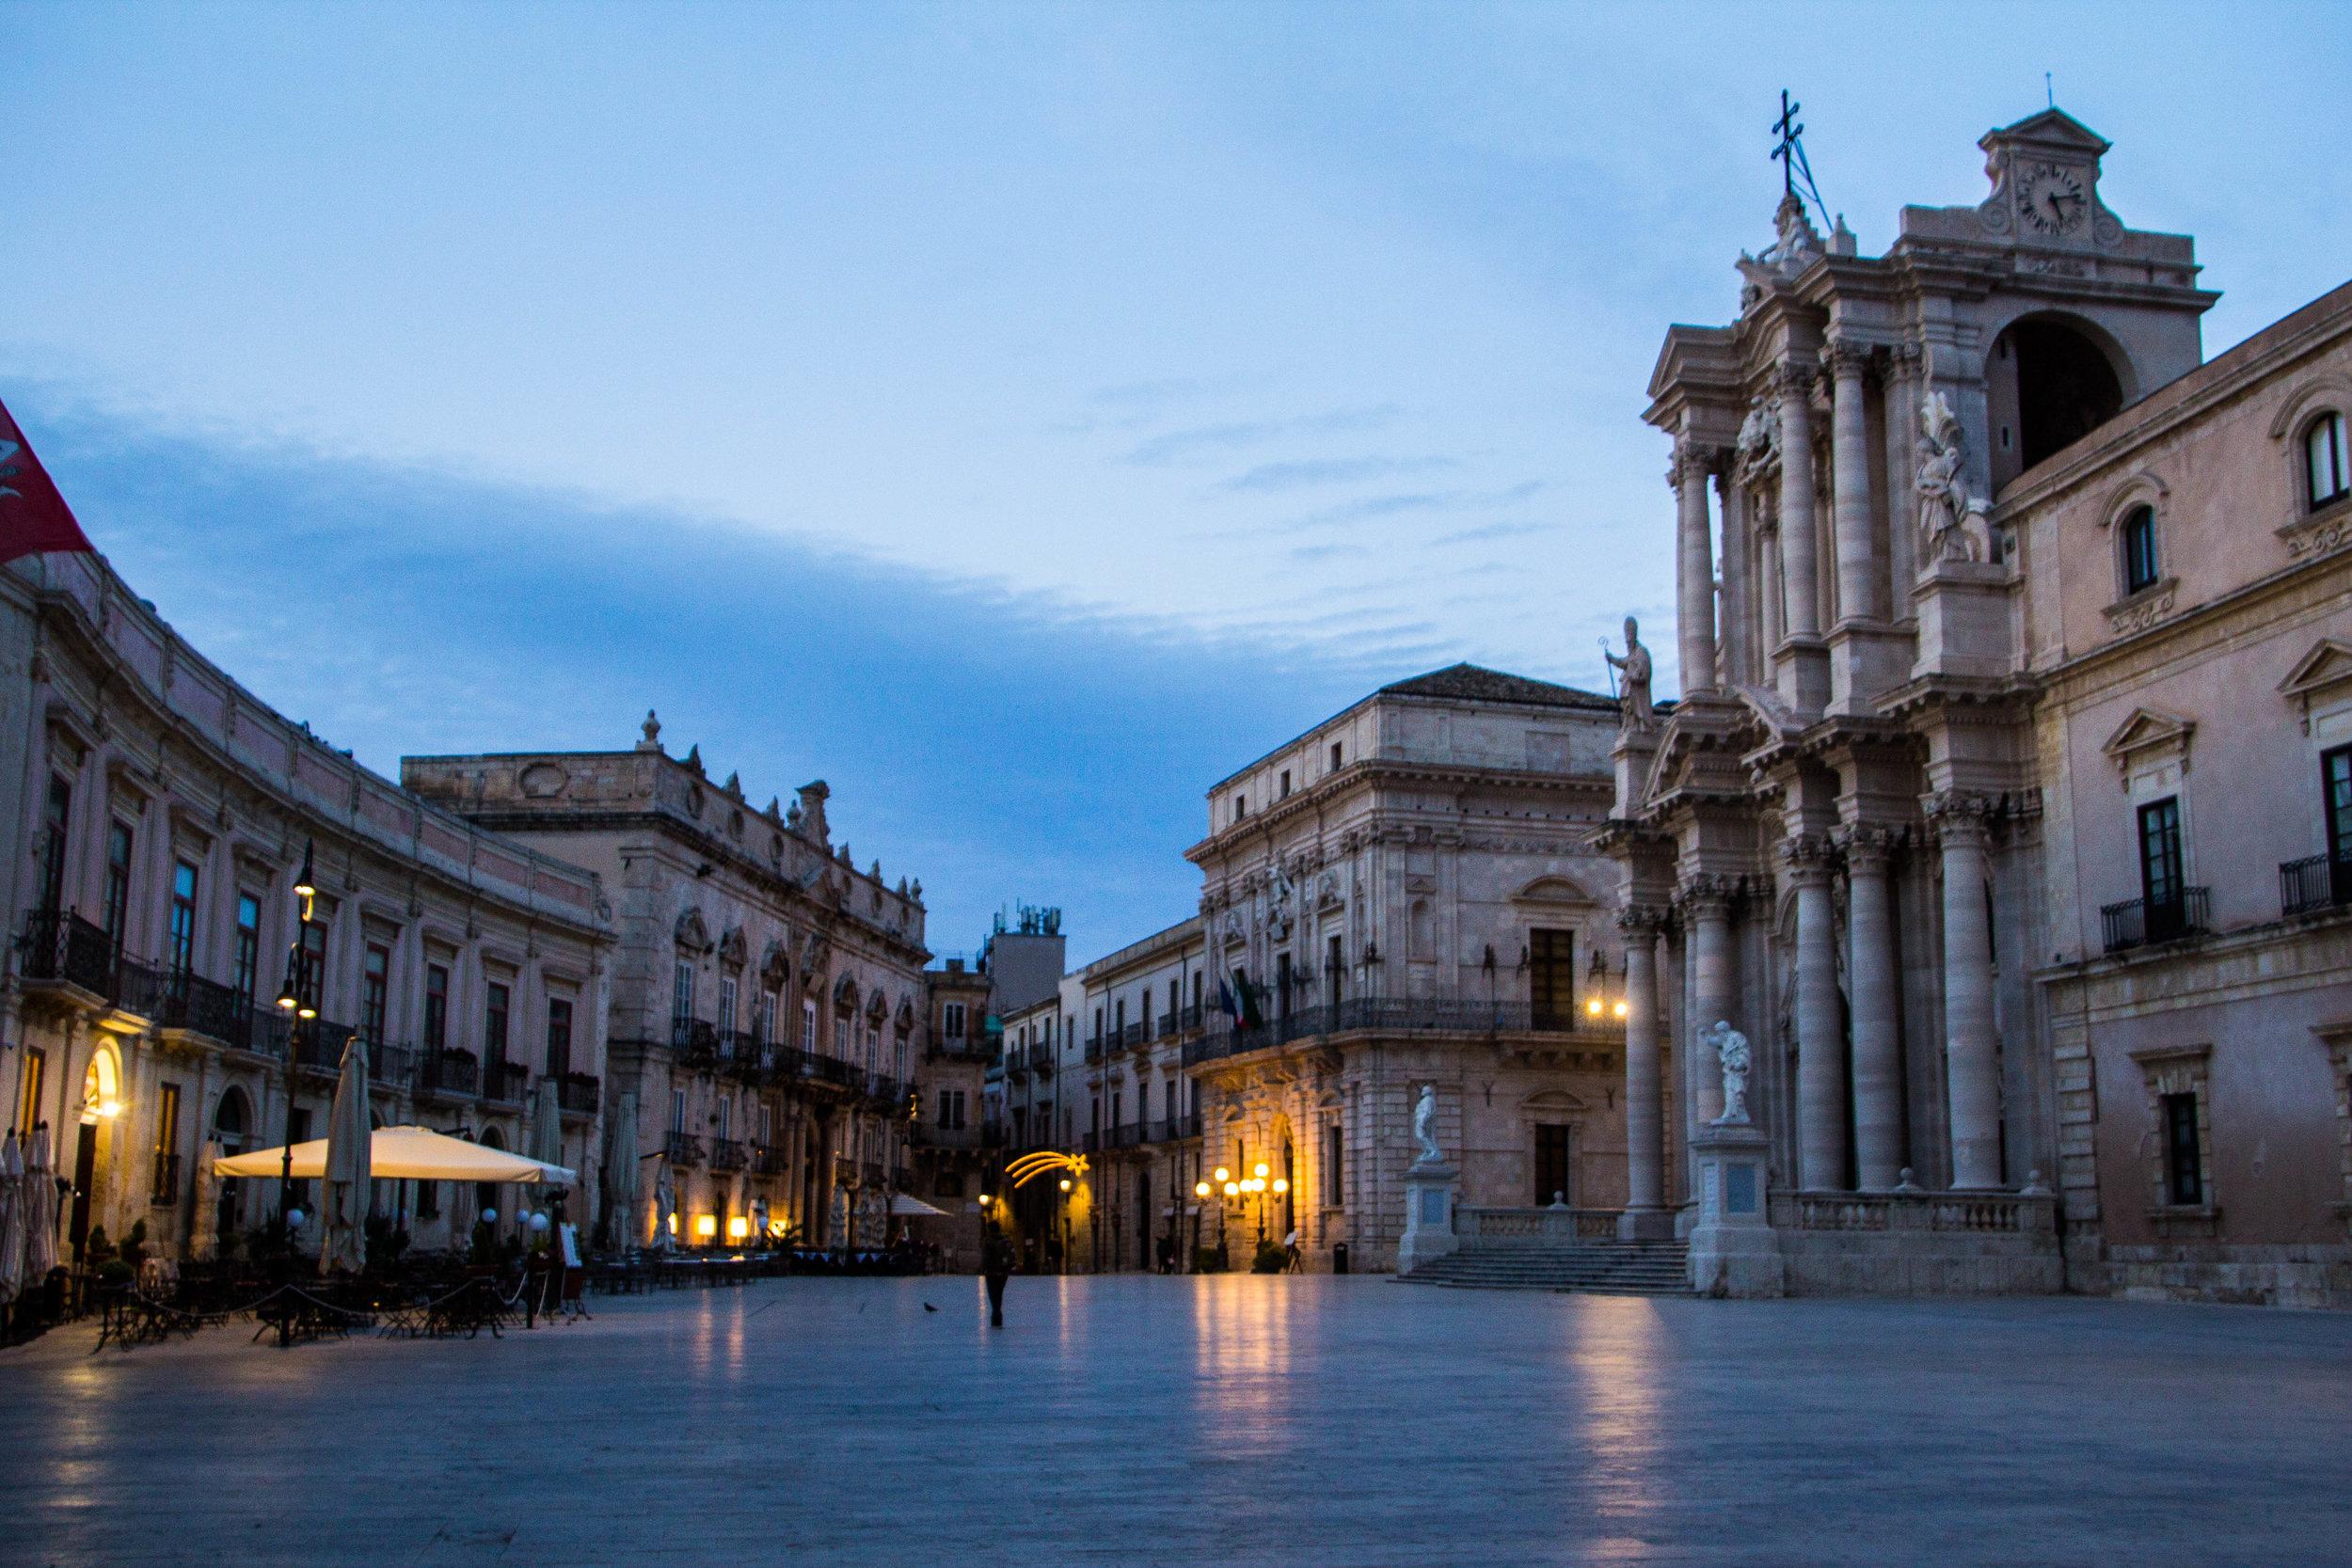 piazza-duomo-sunset-ortygia-syracuse-sicily-19.jpg